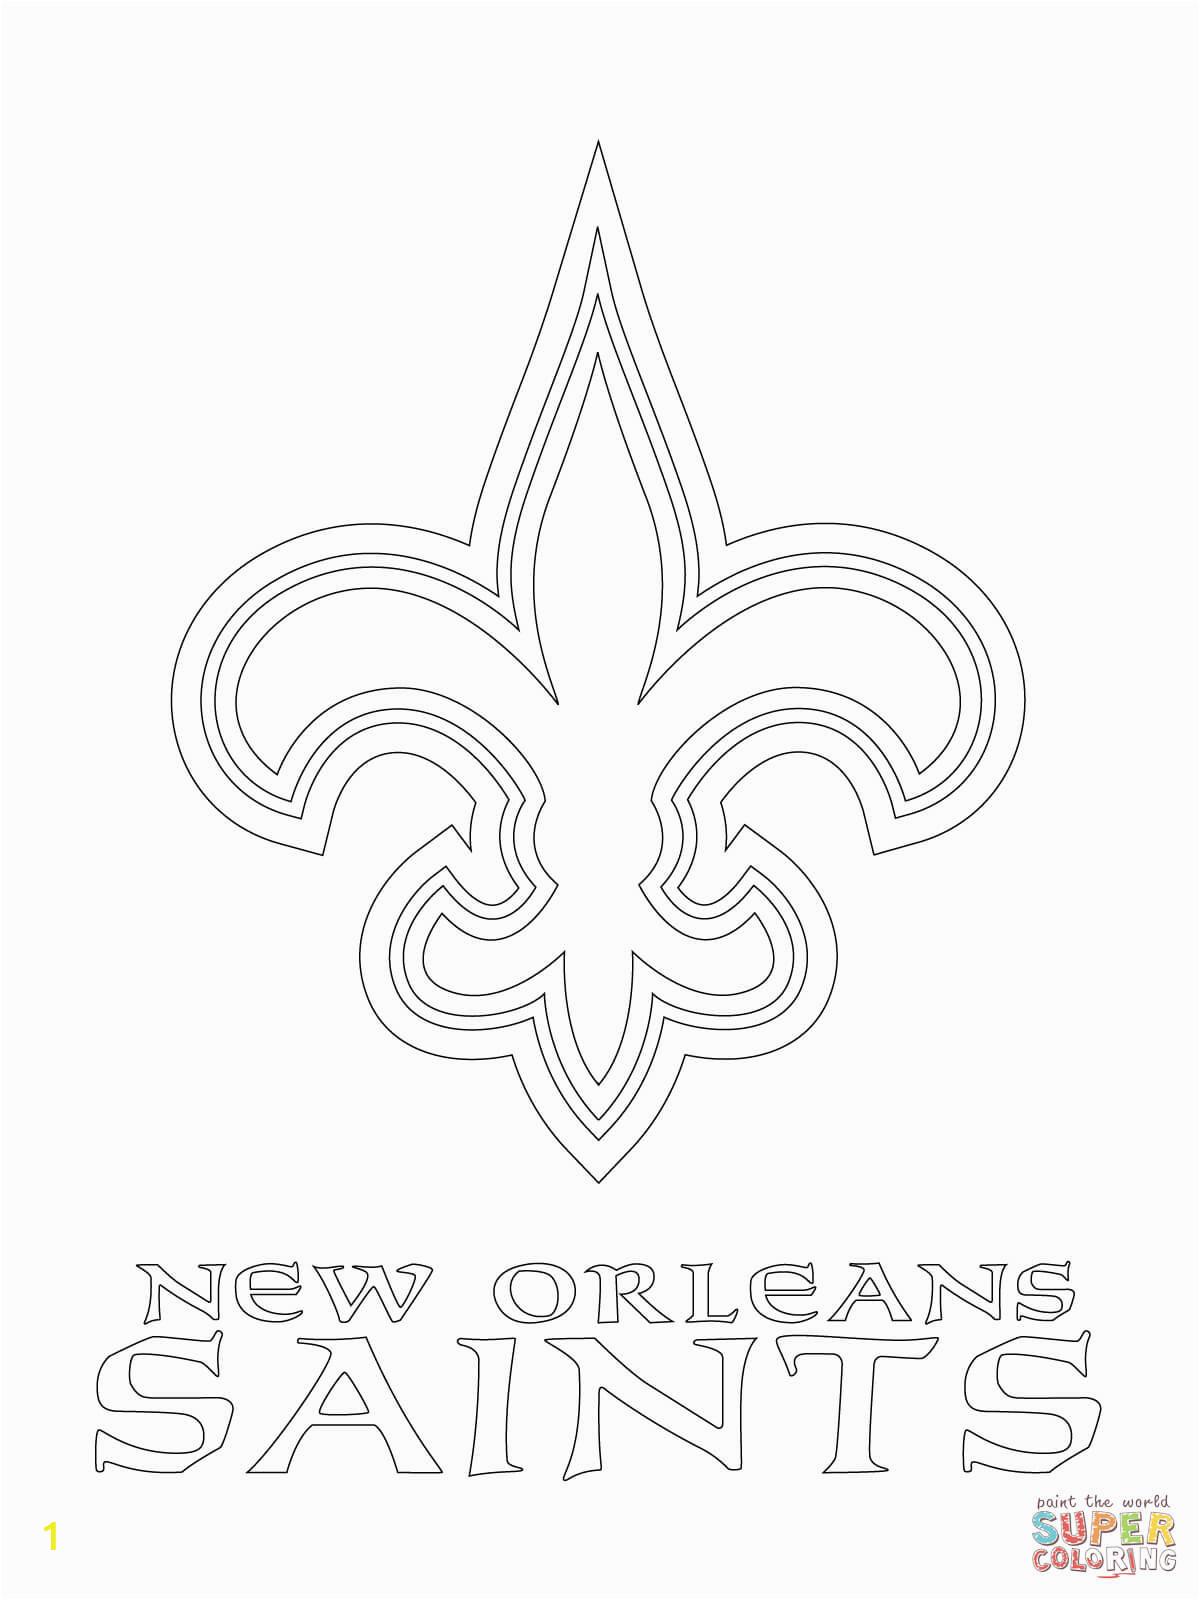 new orleans saints logo coloring page